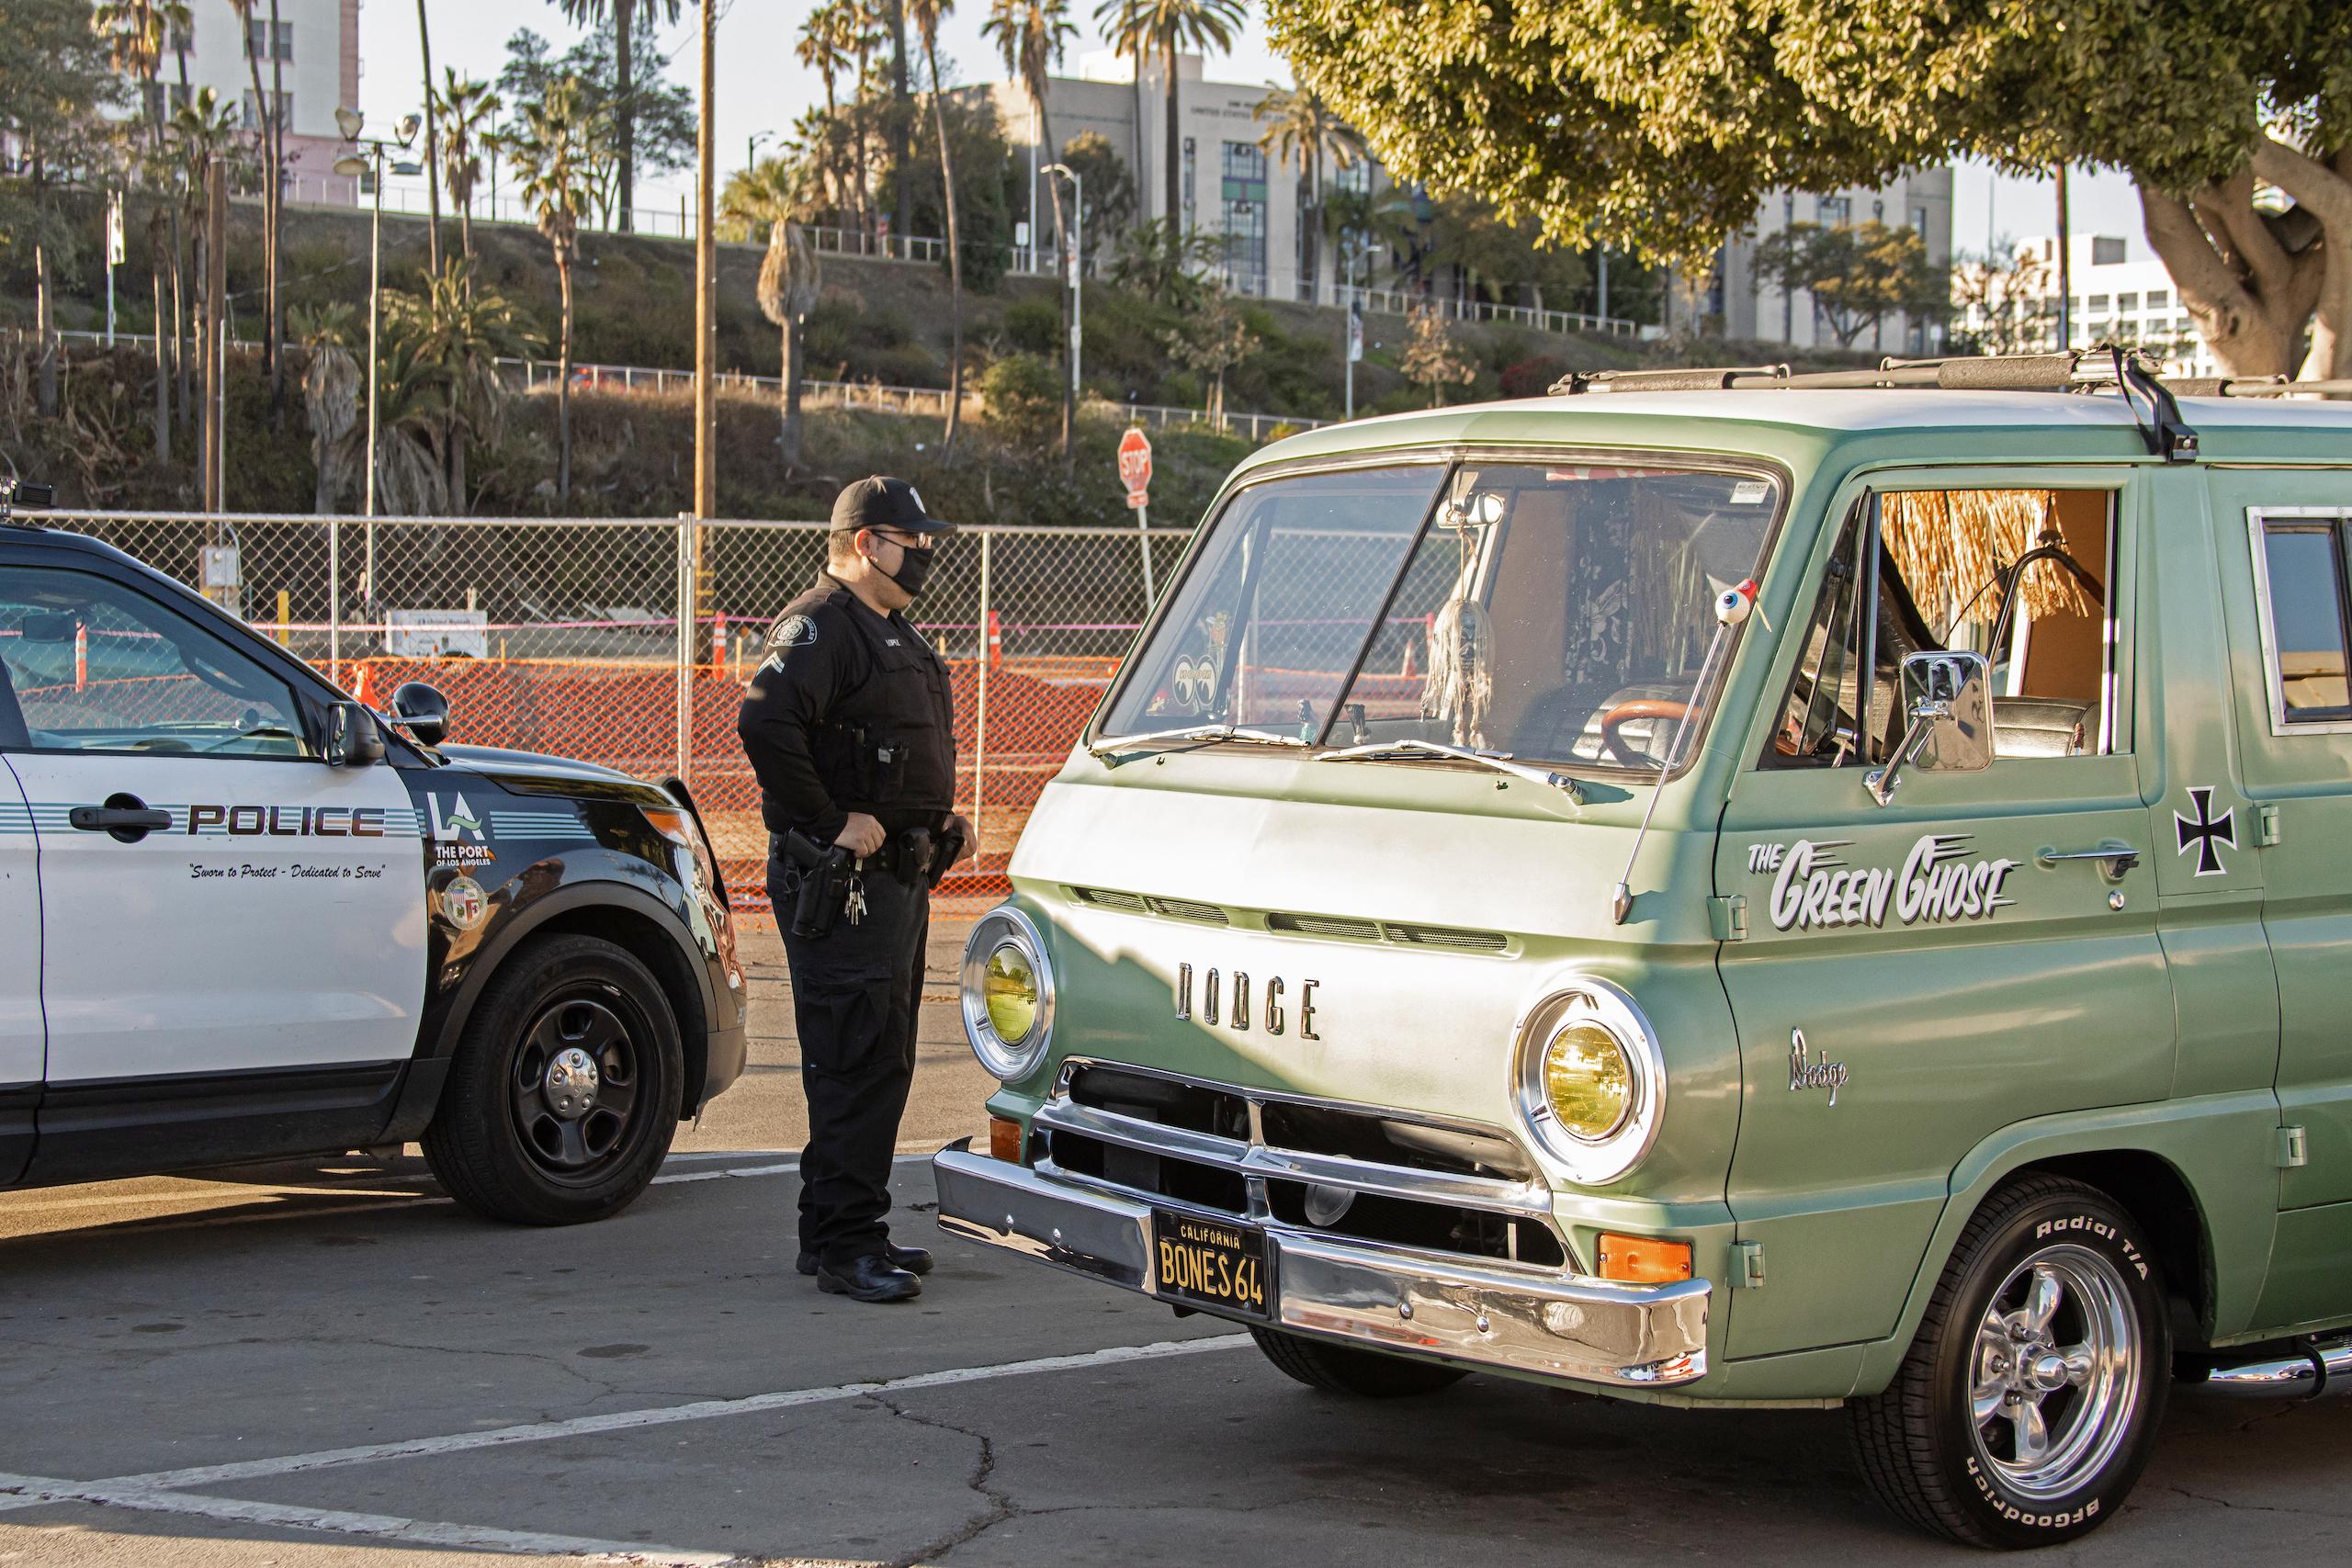 So-Cal Slow Ride Van Run police saying hello